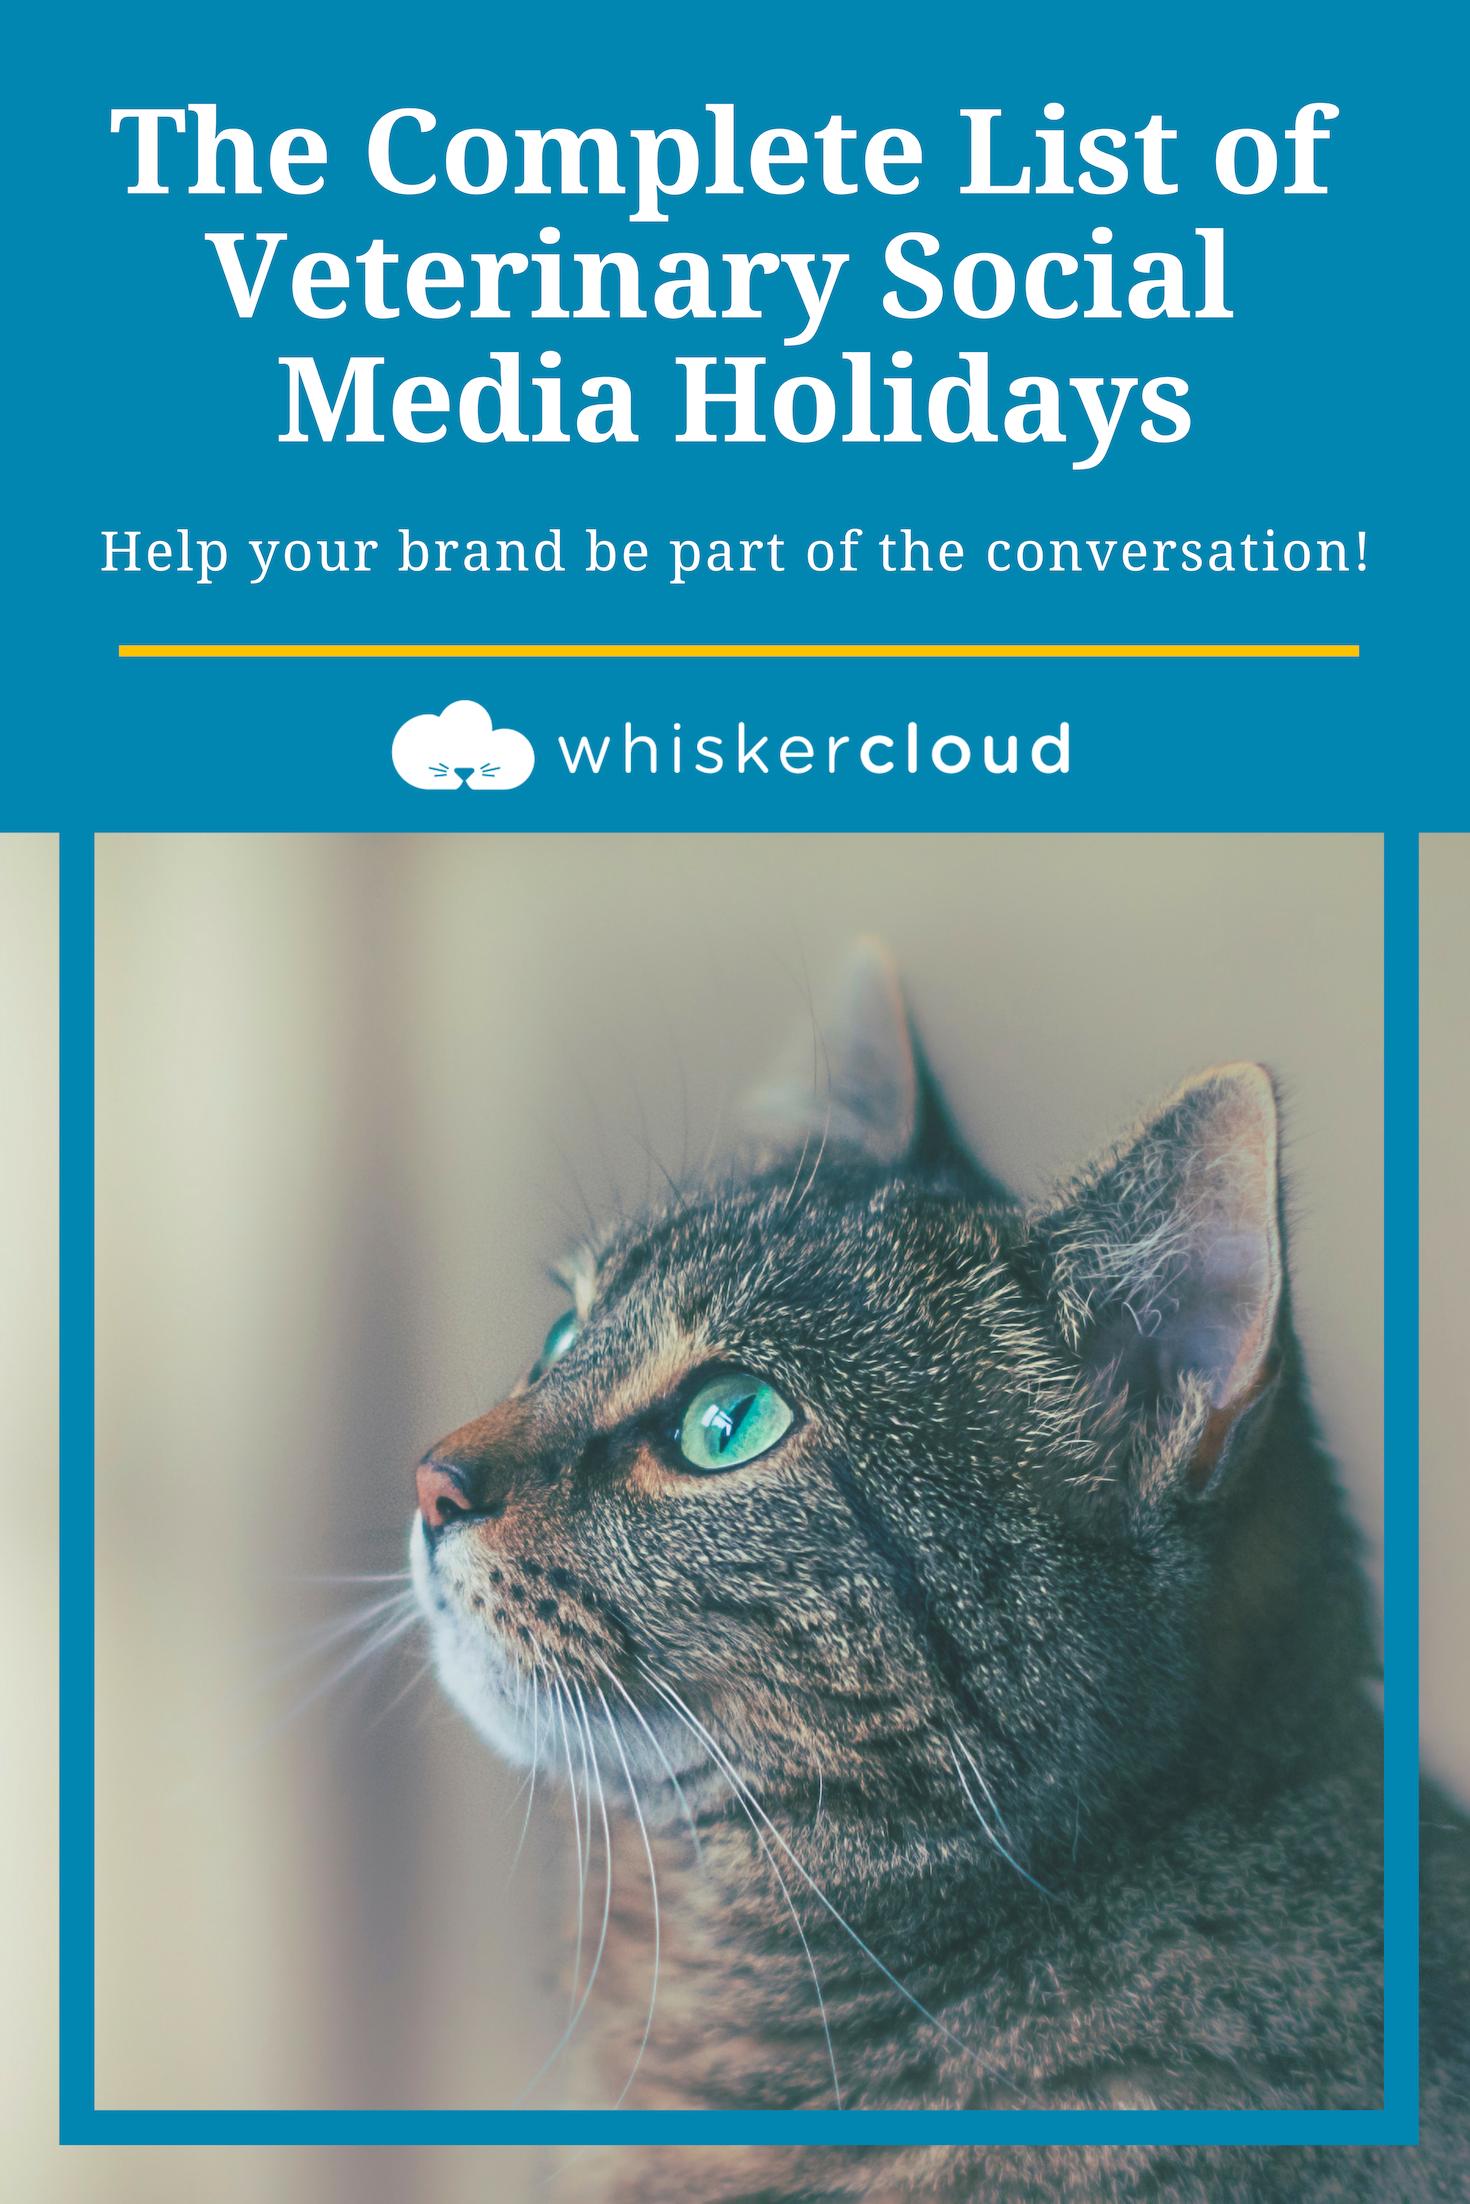 Complete List Of Social Media Holidays For Veterinary Hospitals Veterinary Hospital Veterinary Social Media